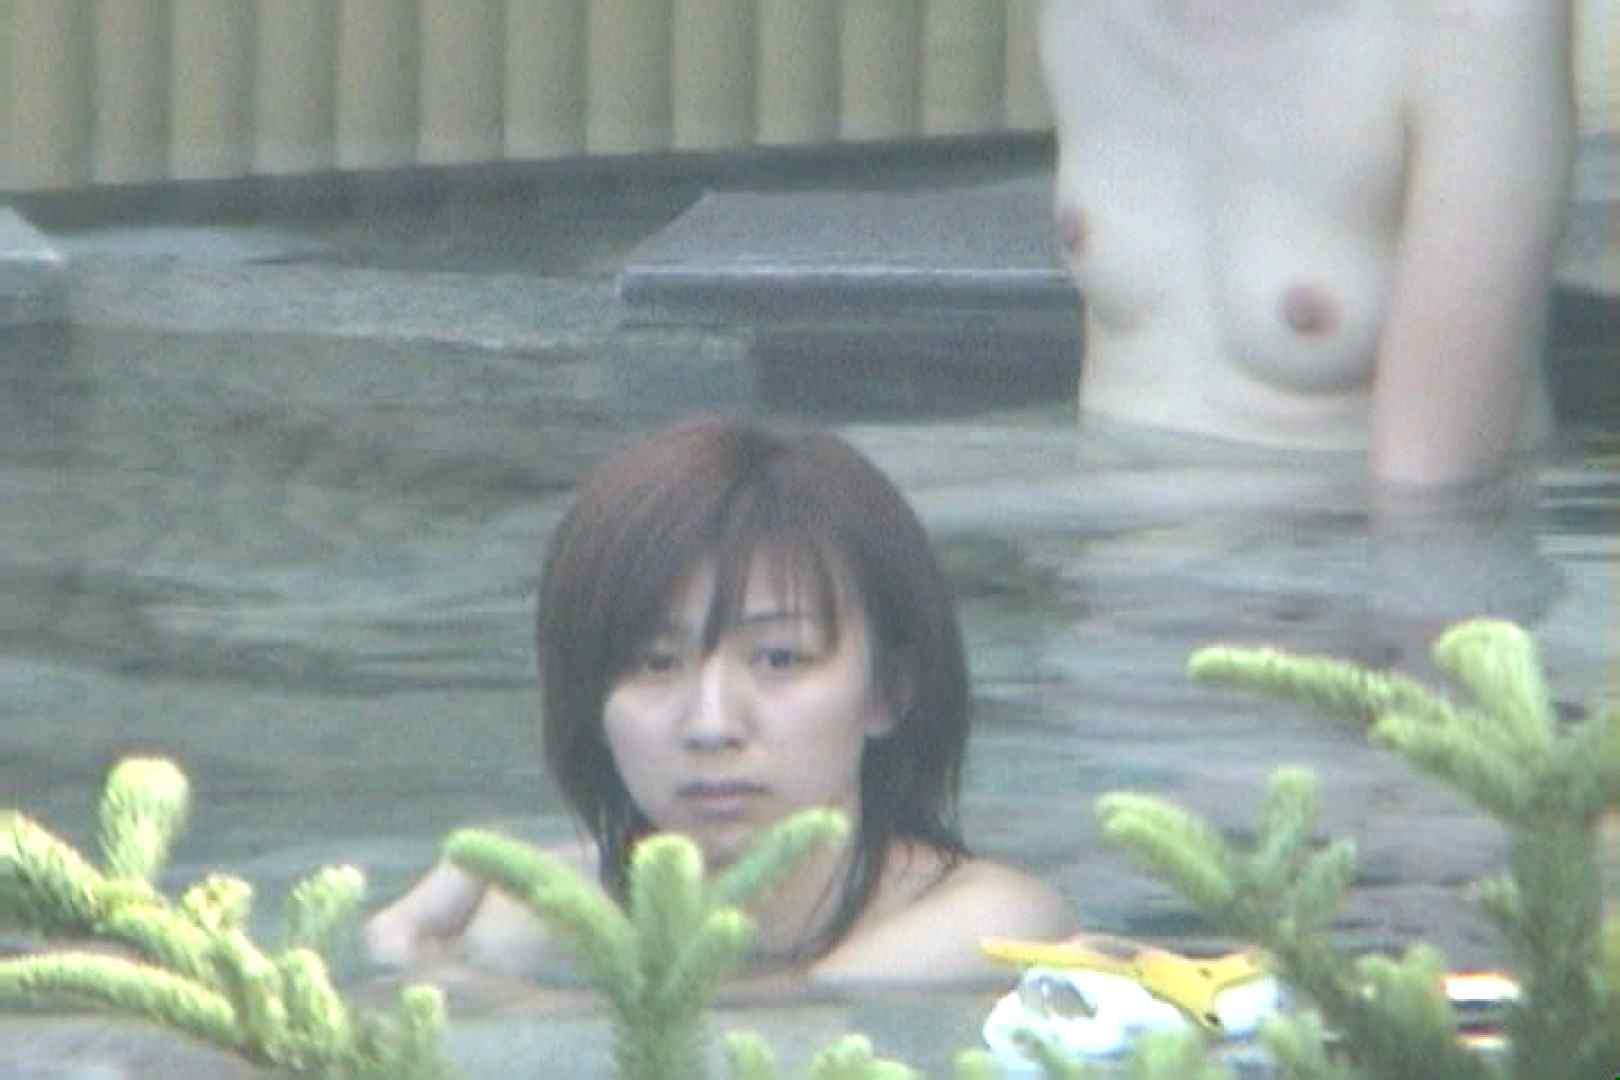 Aquaな露天風呂Vol.77【VIP限定】 露天   盗撮特集  98画像 69